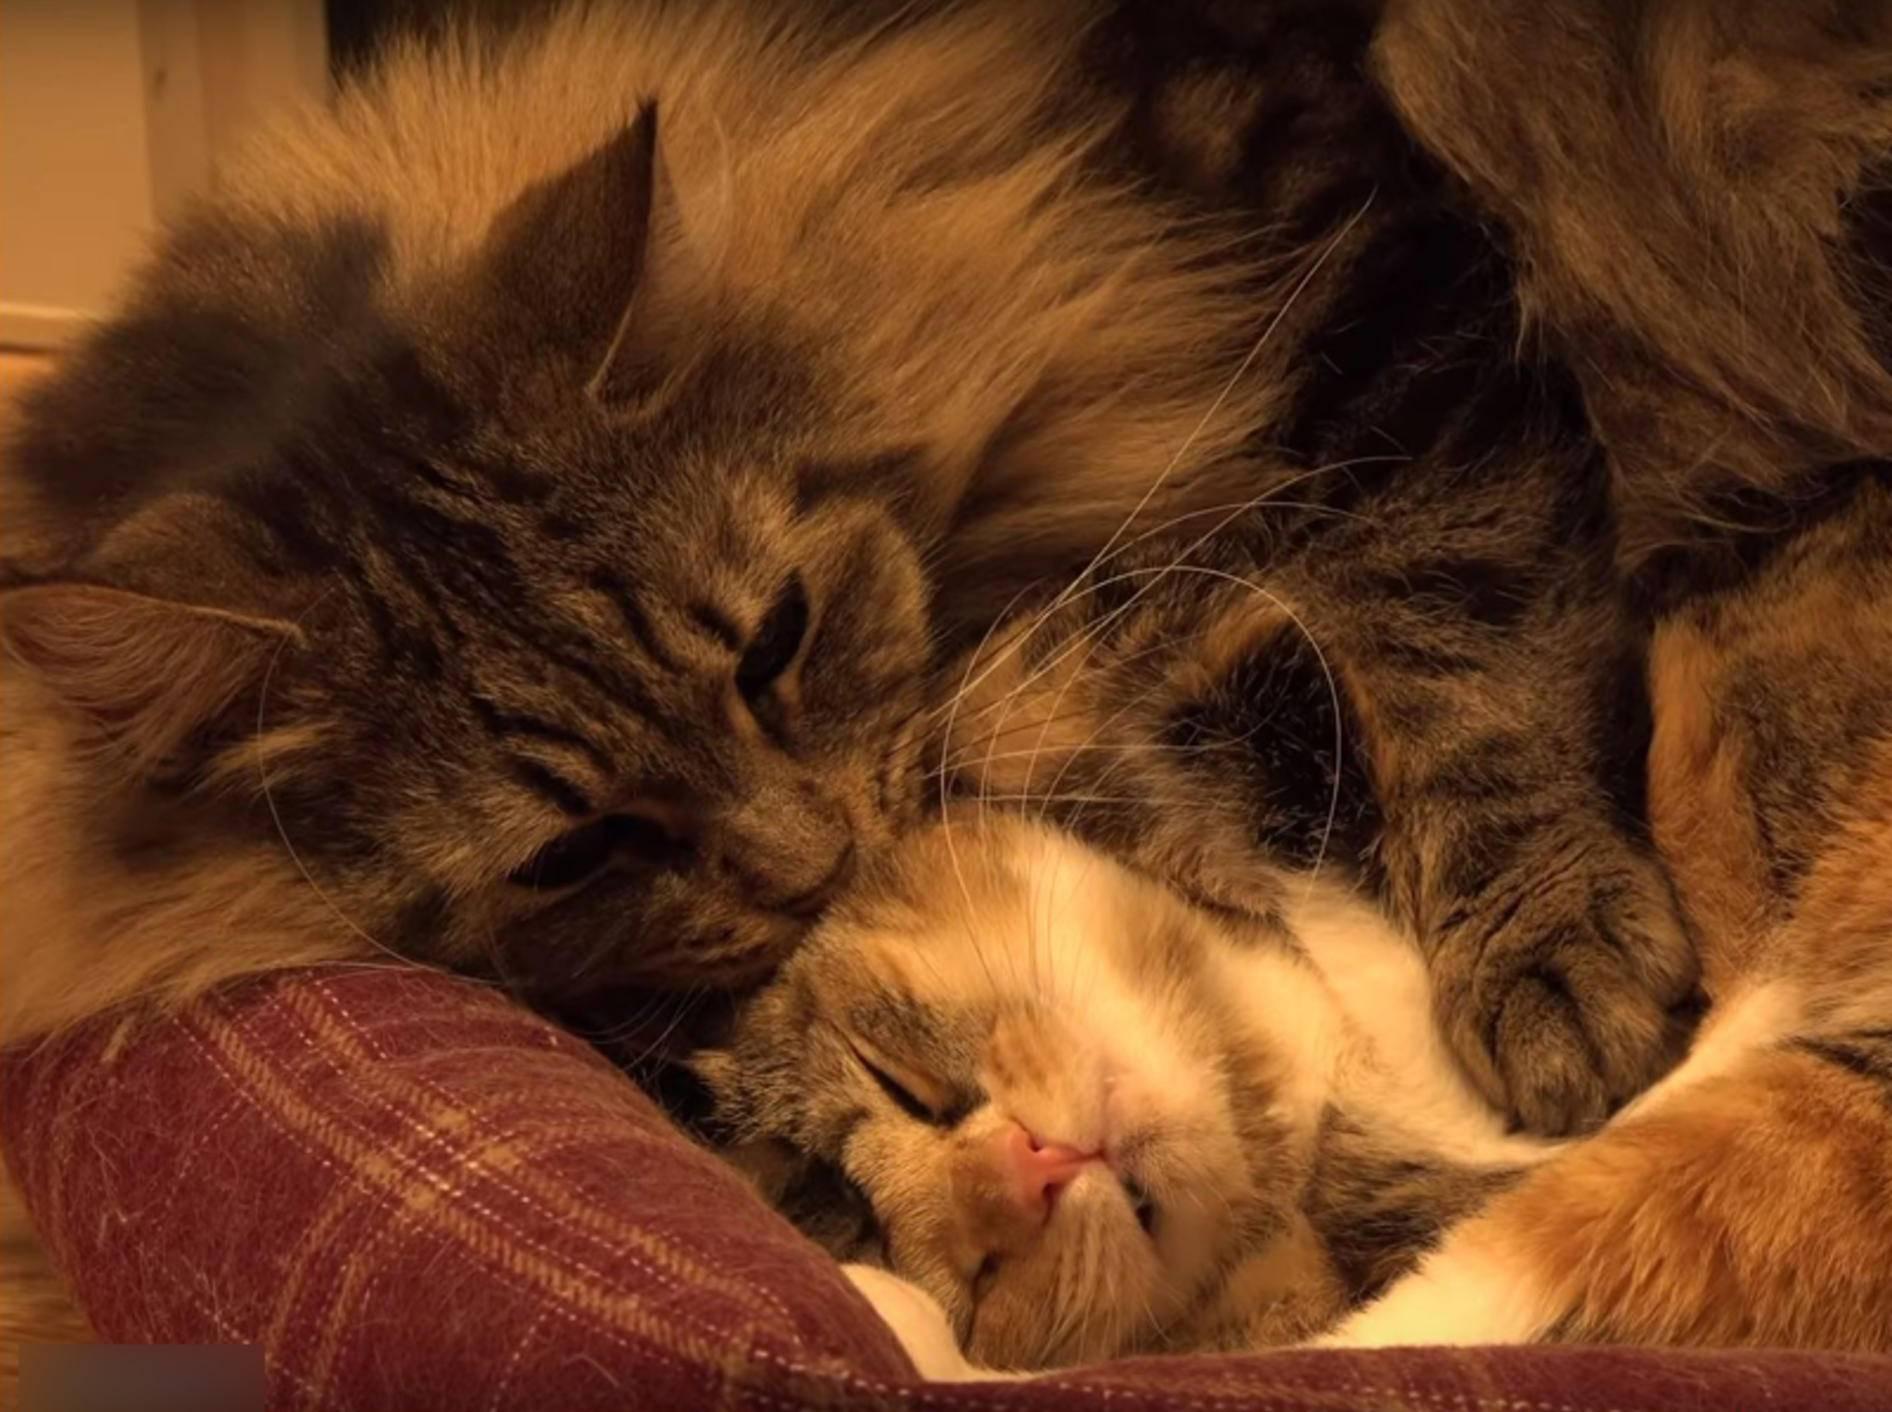 Flauschkater Osamu schnuckelt mit Katzenfreundin Ichigo – YouTube / 10 Cats.+